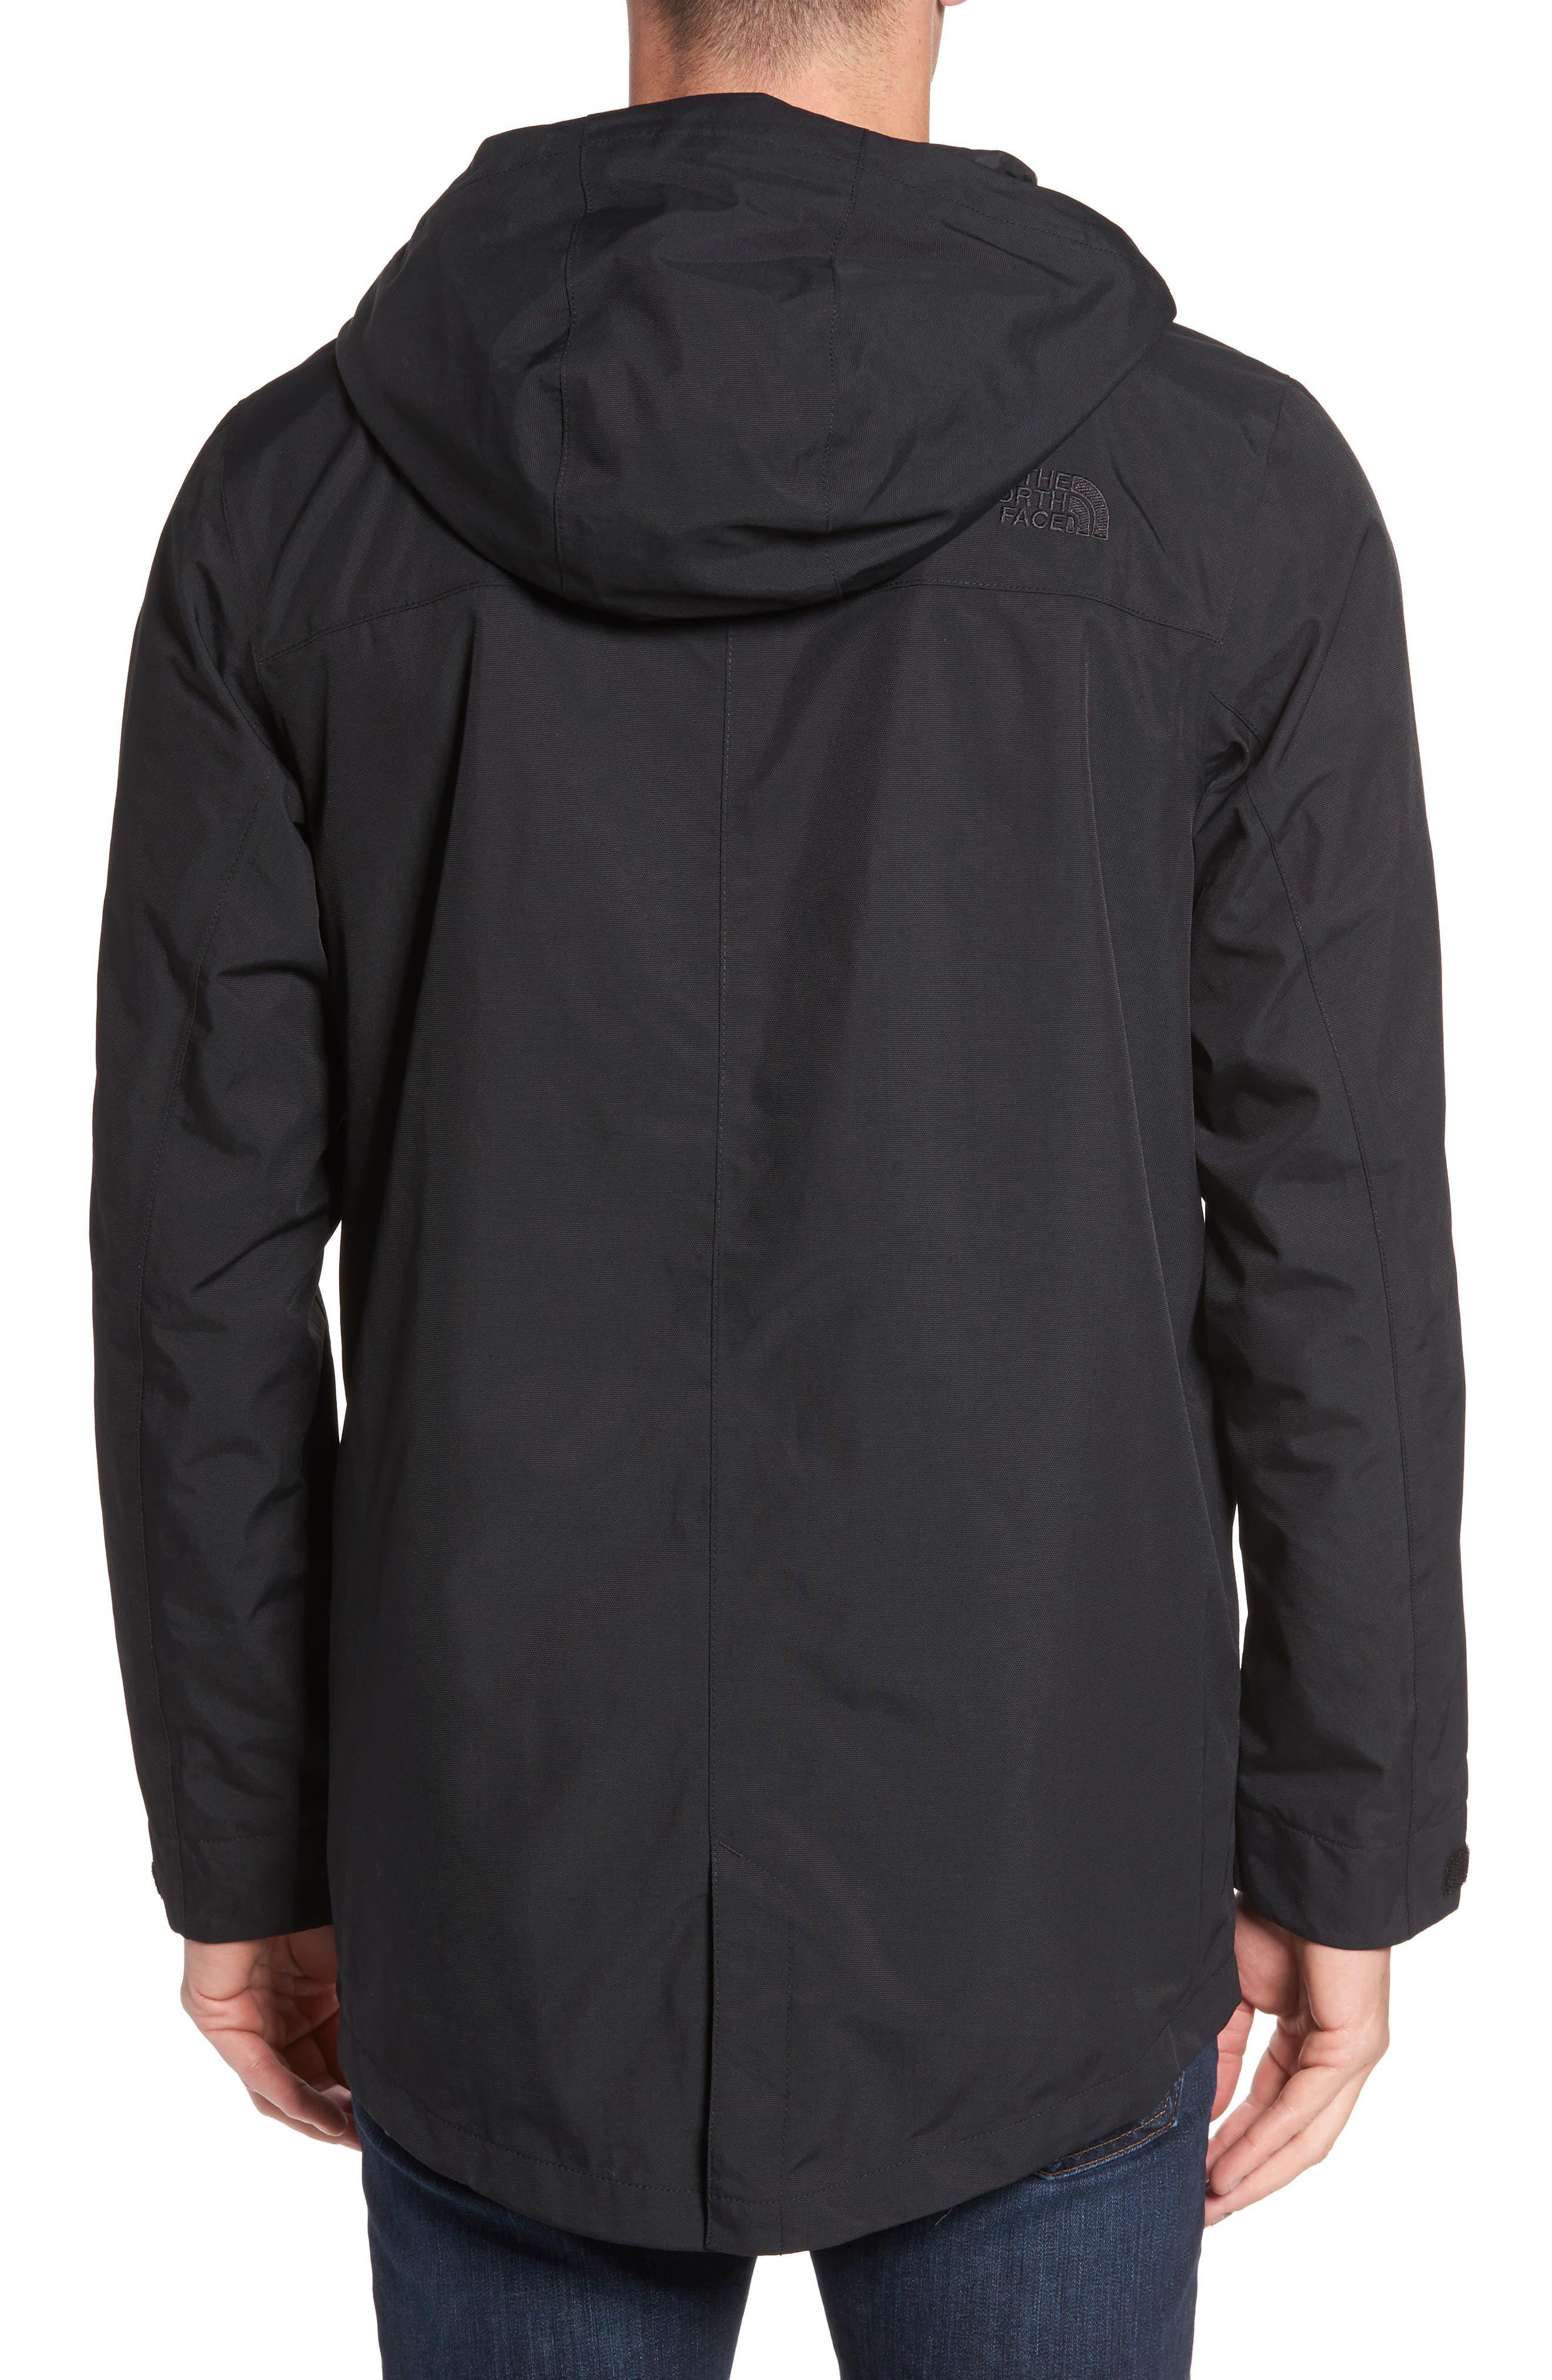 El Misti Trench II Hooded Jacket,                             Alternate thumbnail 2, color,                             BLACK